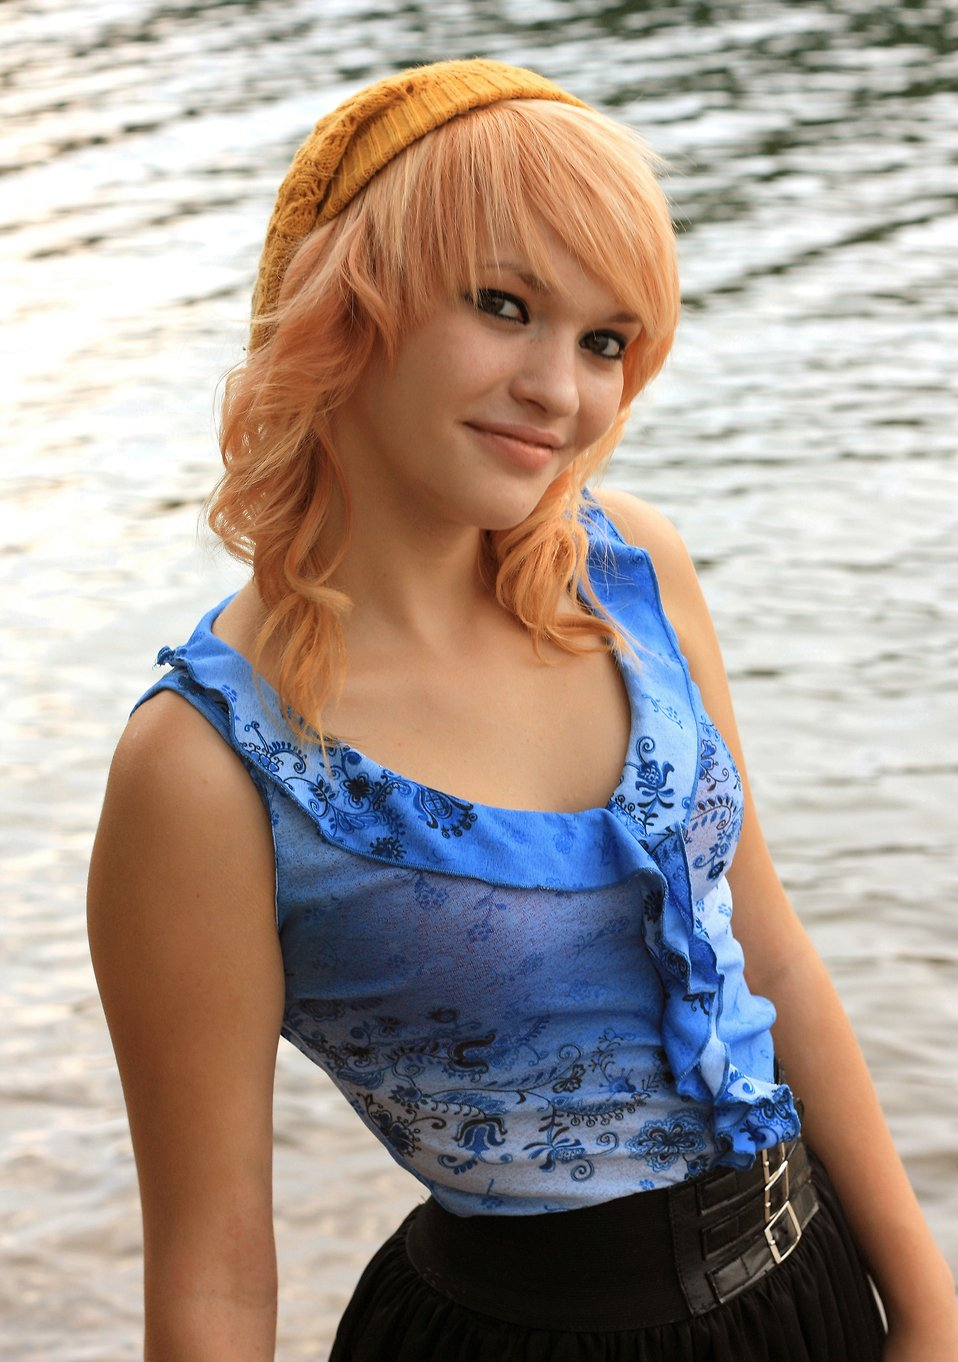 Free Stock Photo: A beautiful young woman posing by a lake.